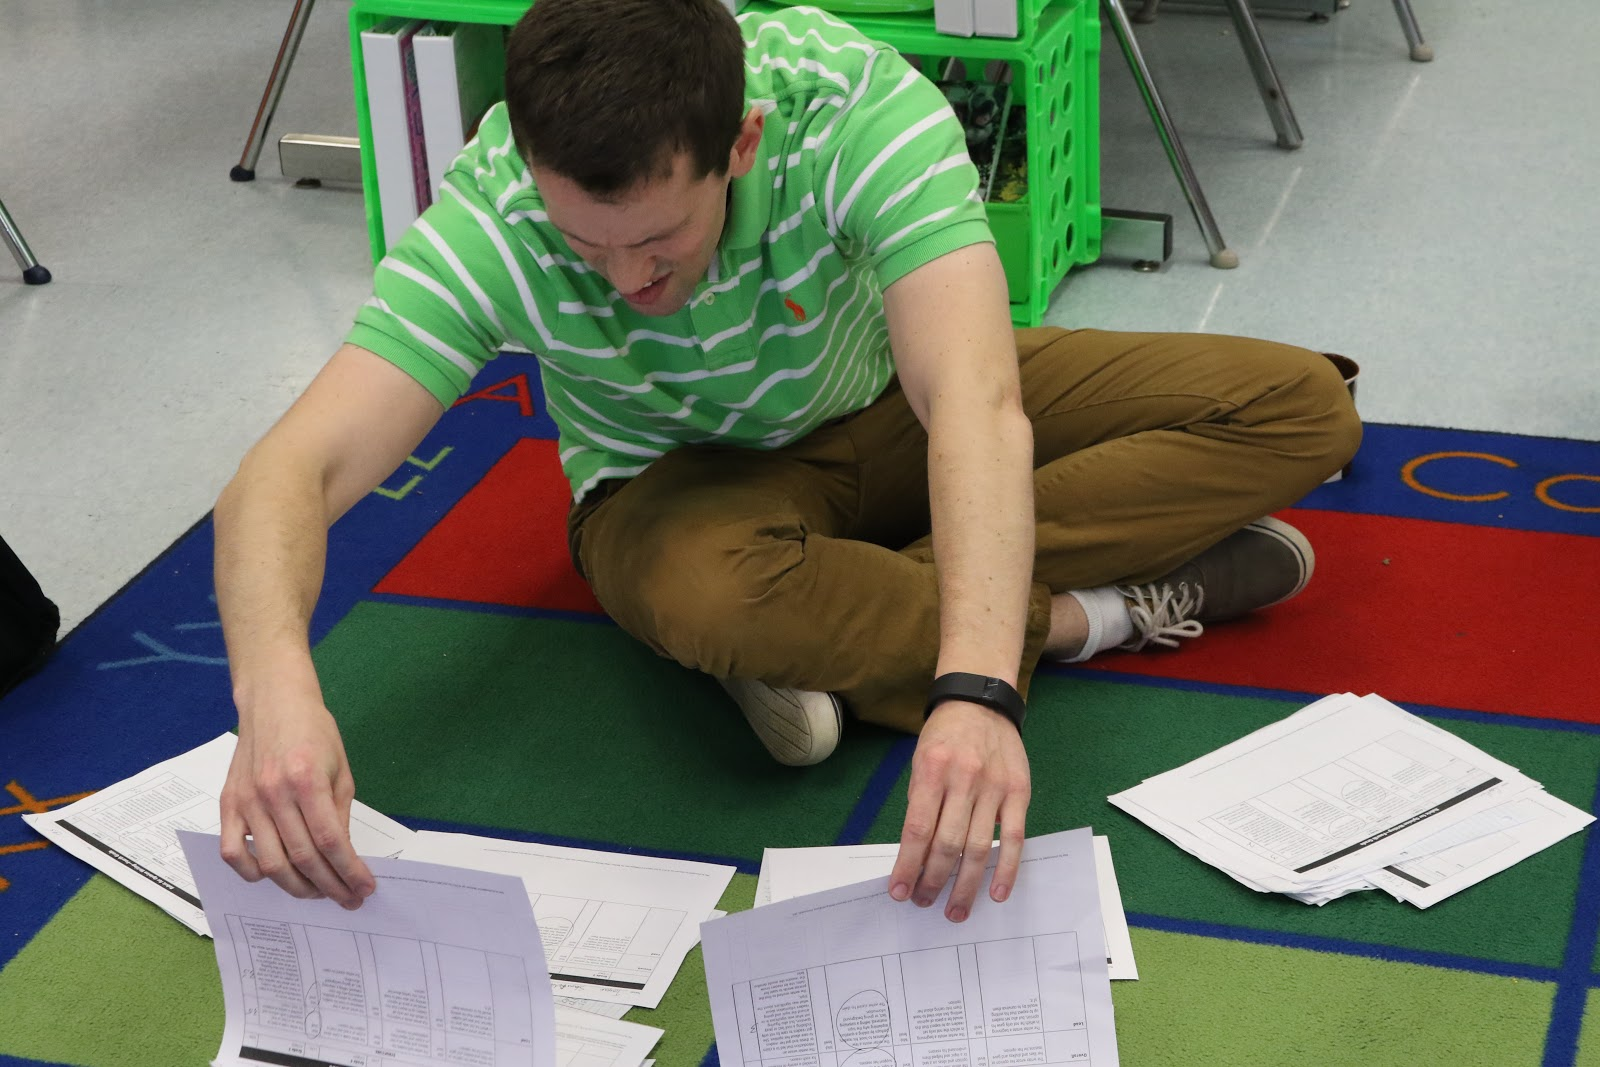 Ryan Proctor analyzing data